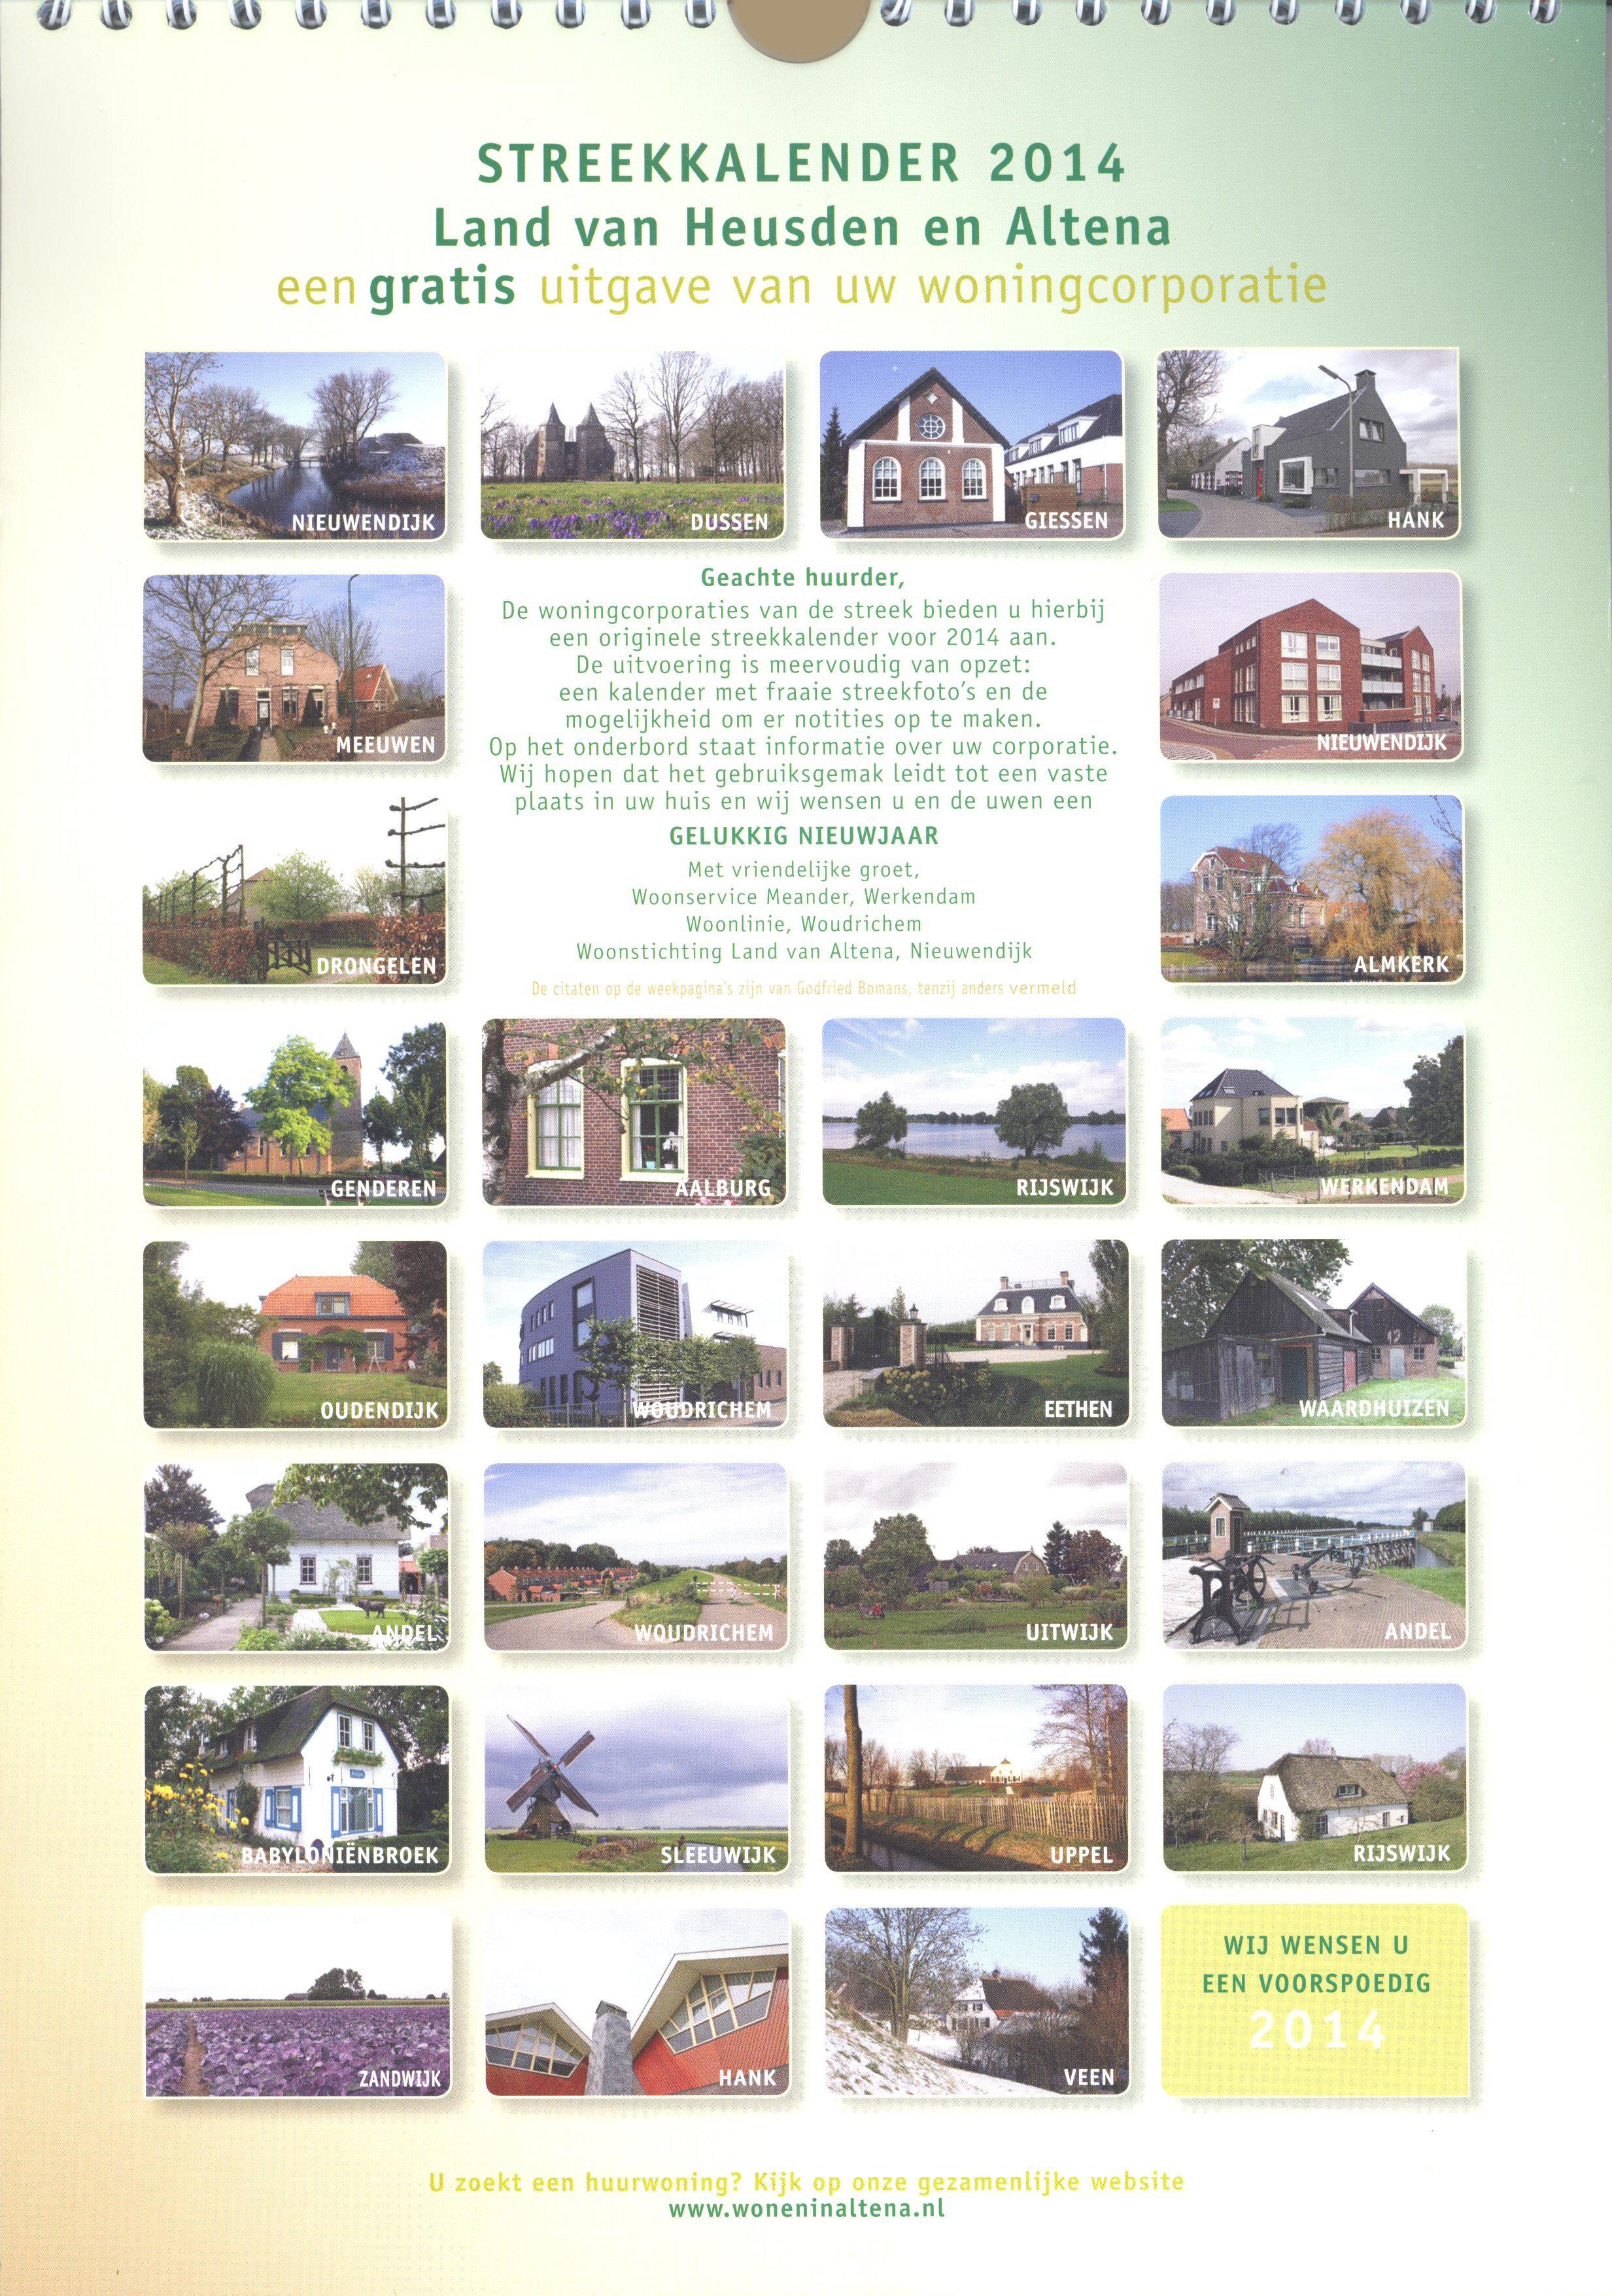 Kalender 005a Streekkalender 2014